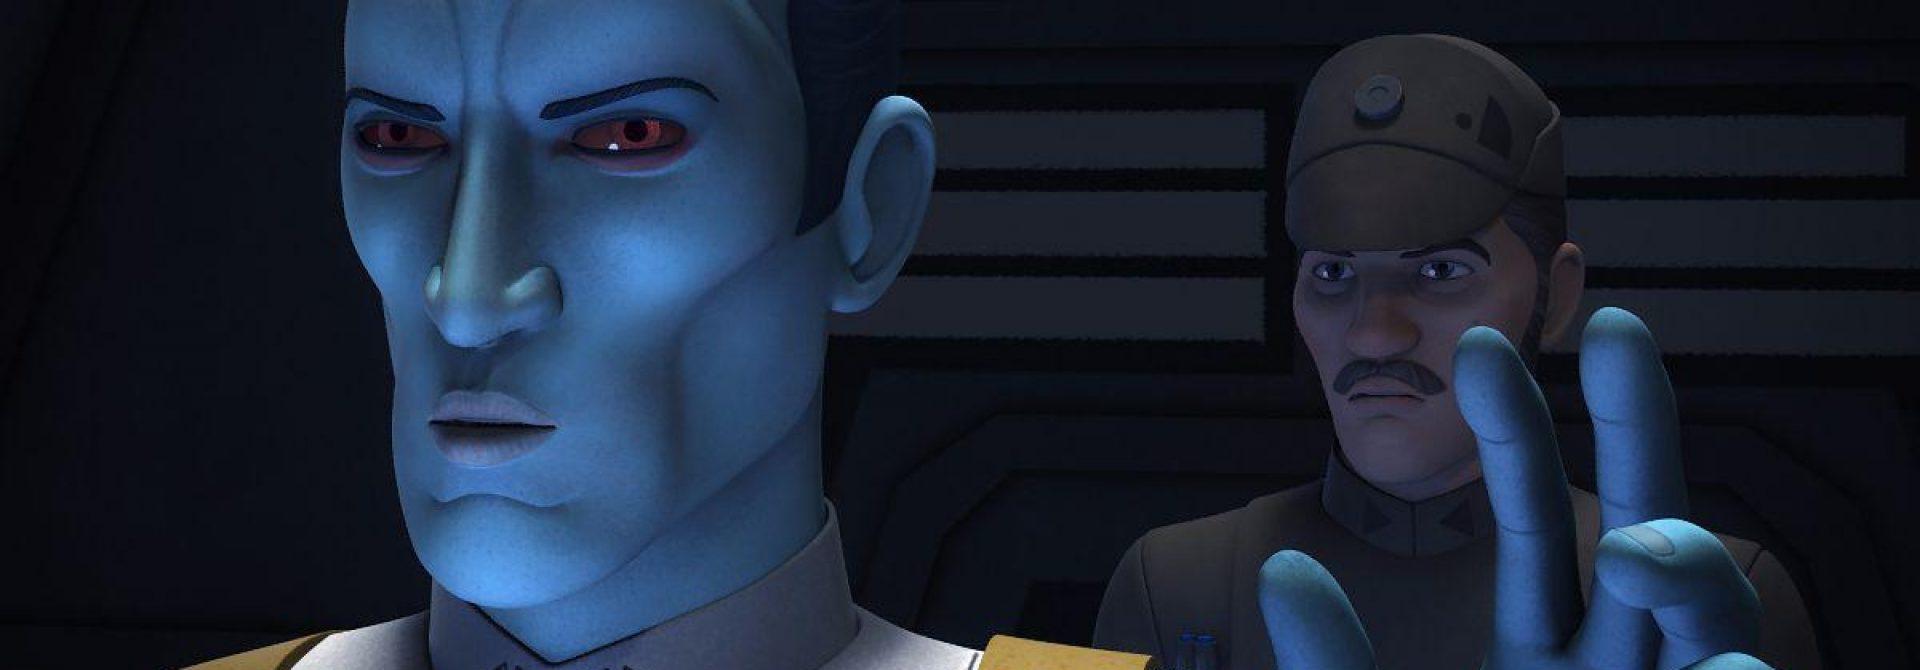 Star Wars Rebels: Thrawn Prepares to Strike